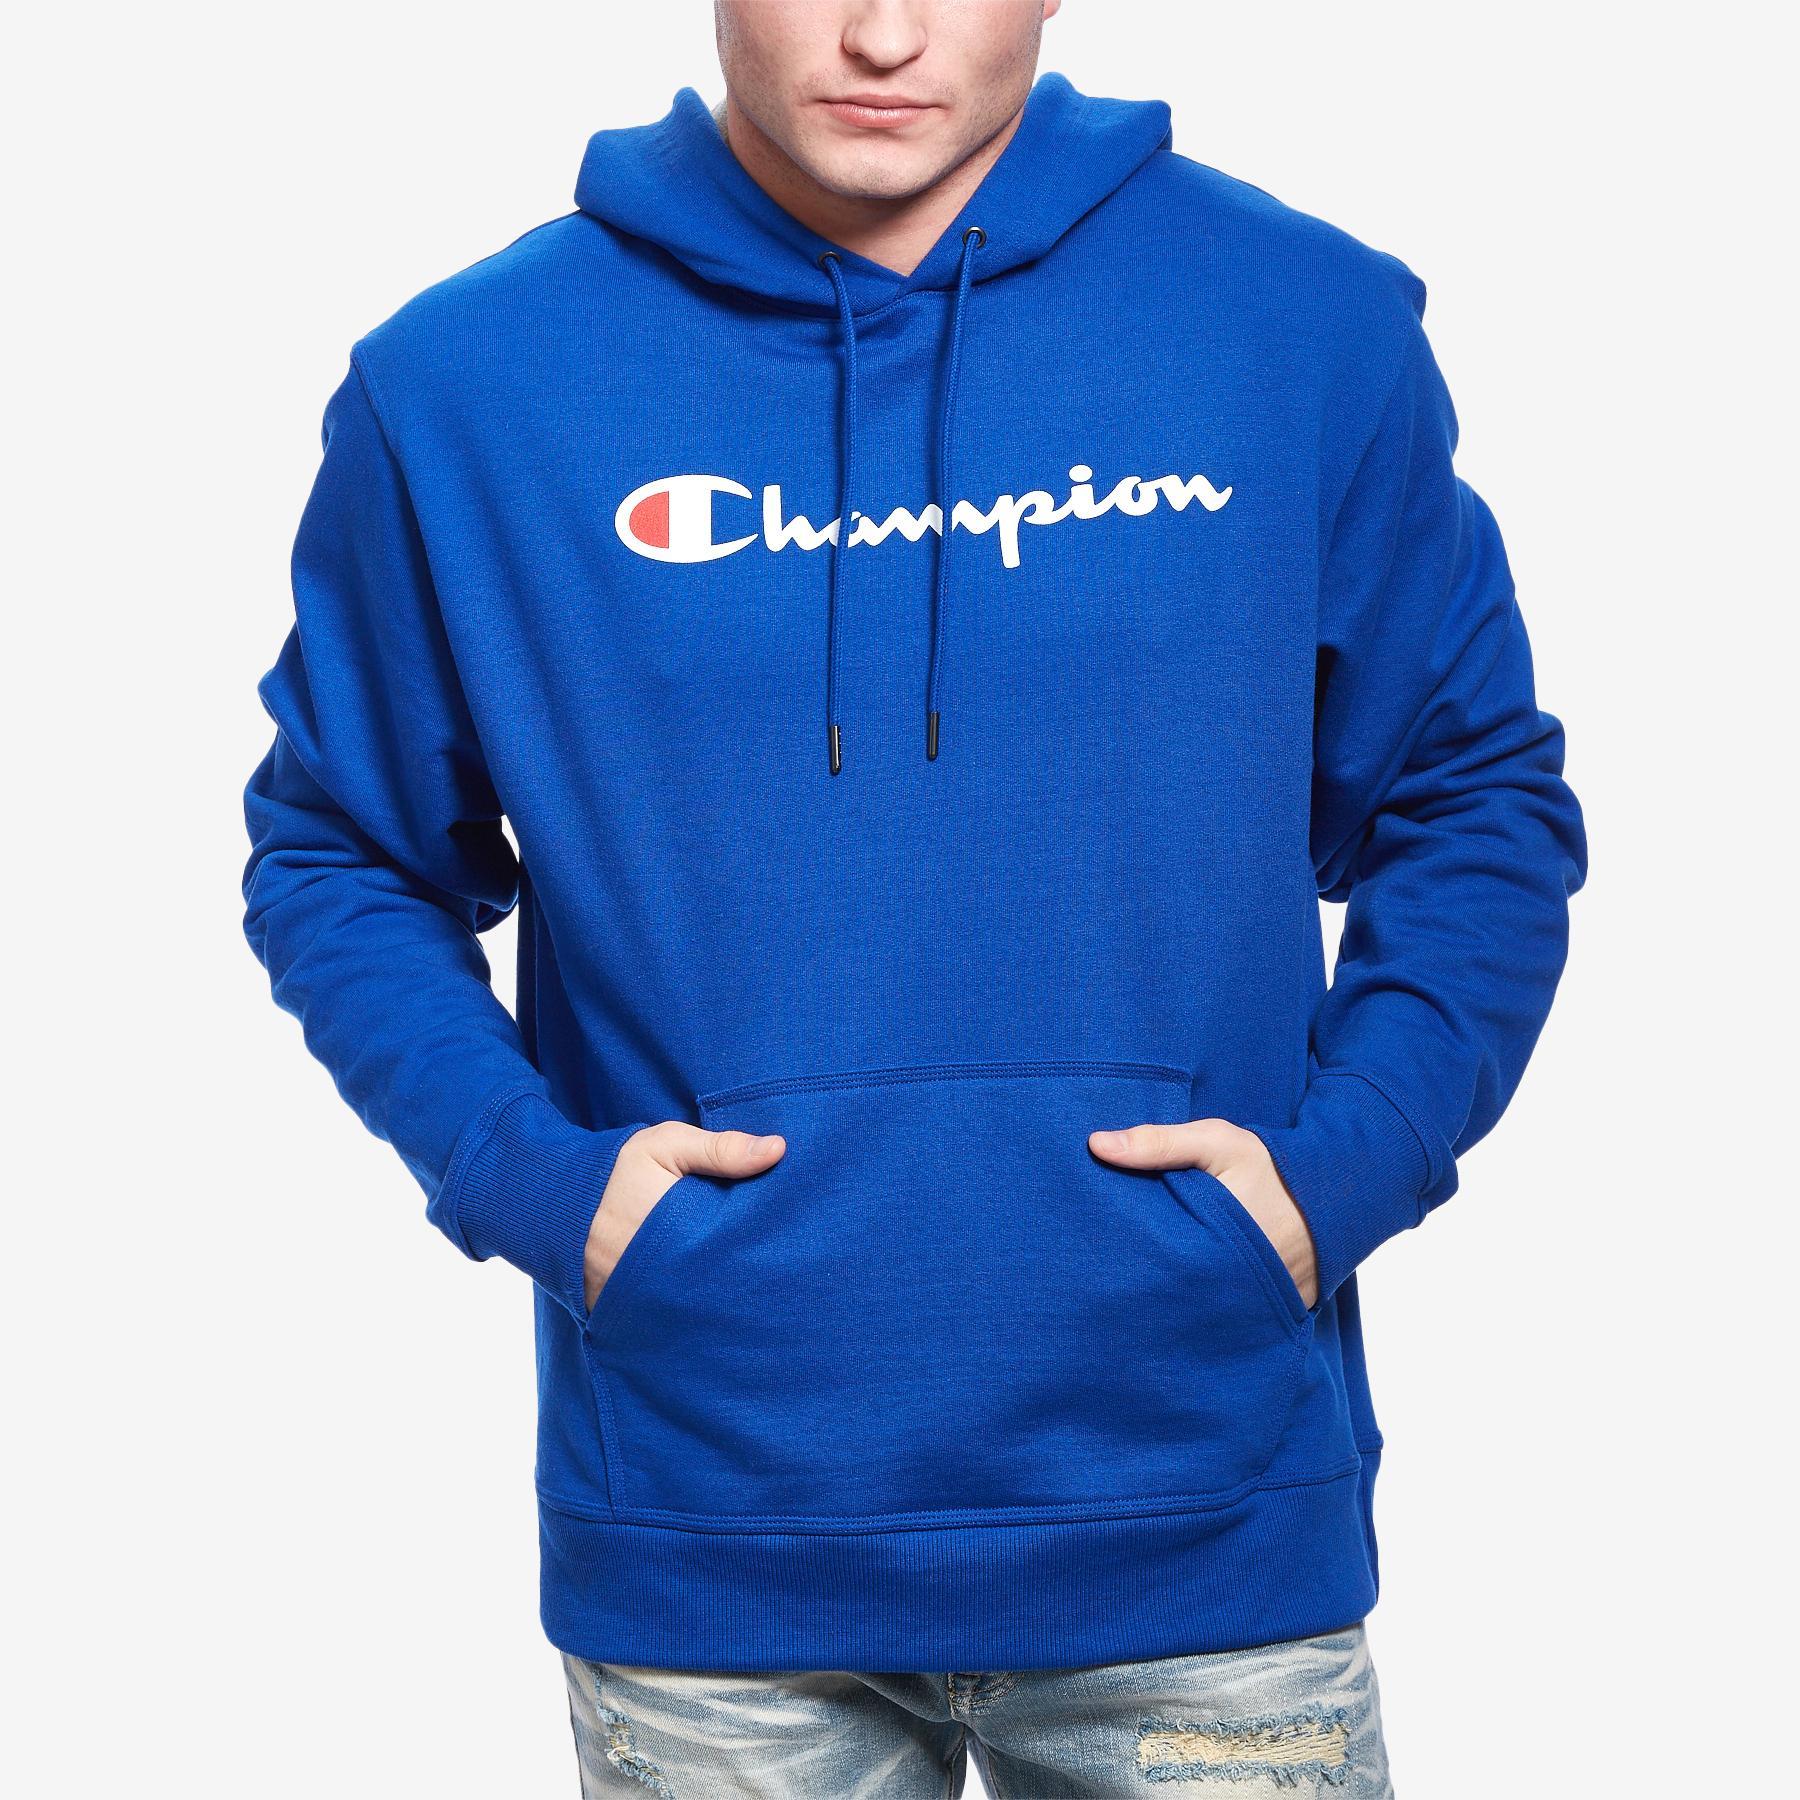 Powerblend Fleece Pullover Hoodie, Script Logo